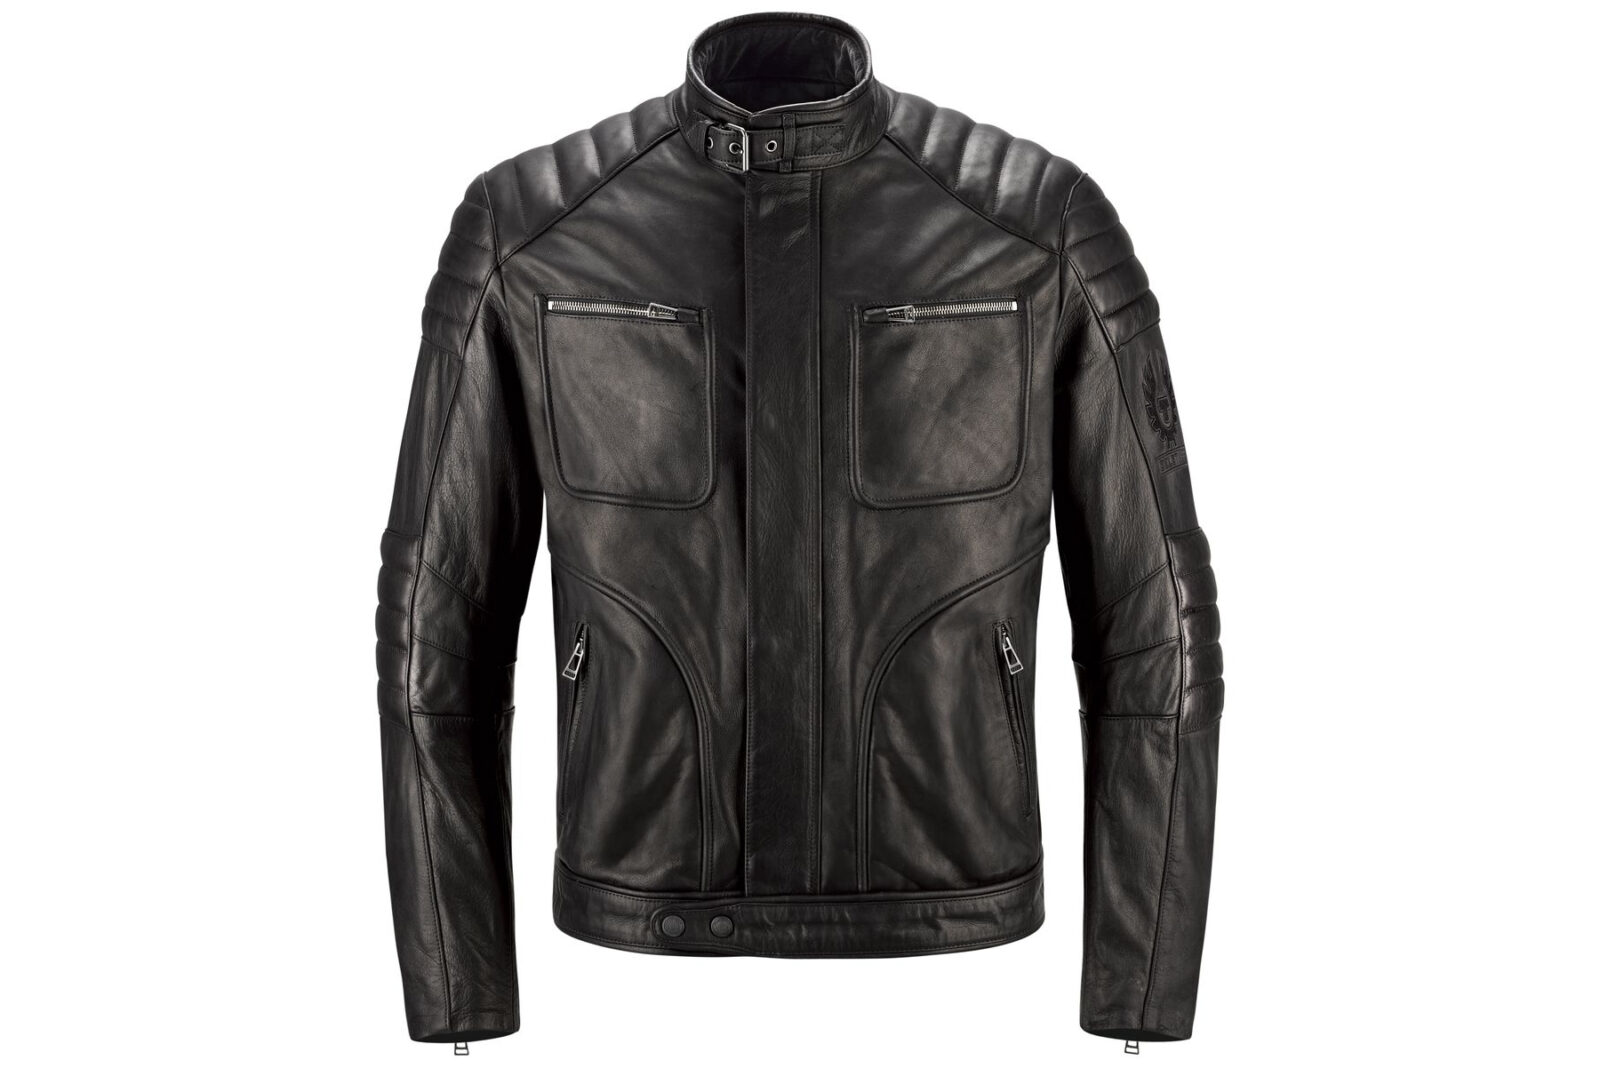 Belstaff Raleigh Jacket 1600x1076 - Belstaff Raleigh Jacket